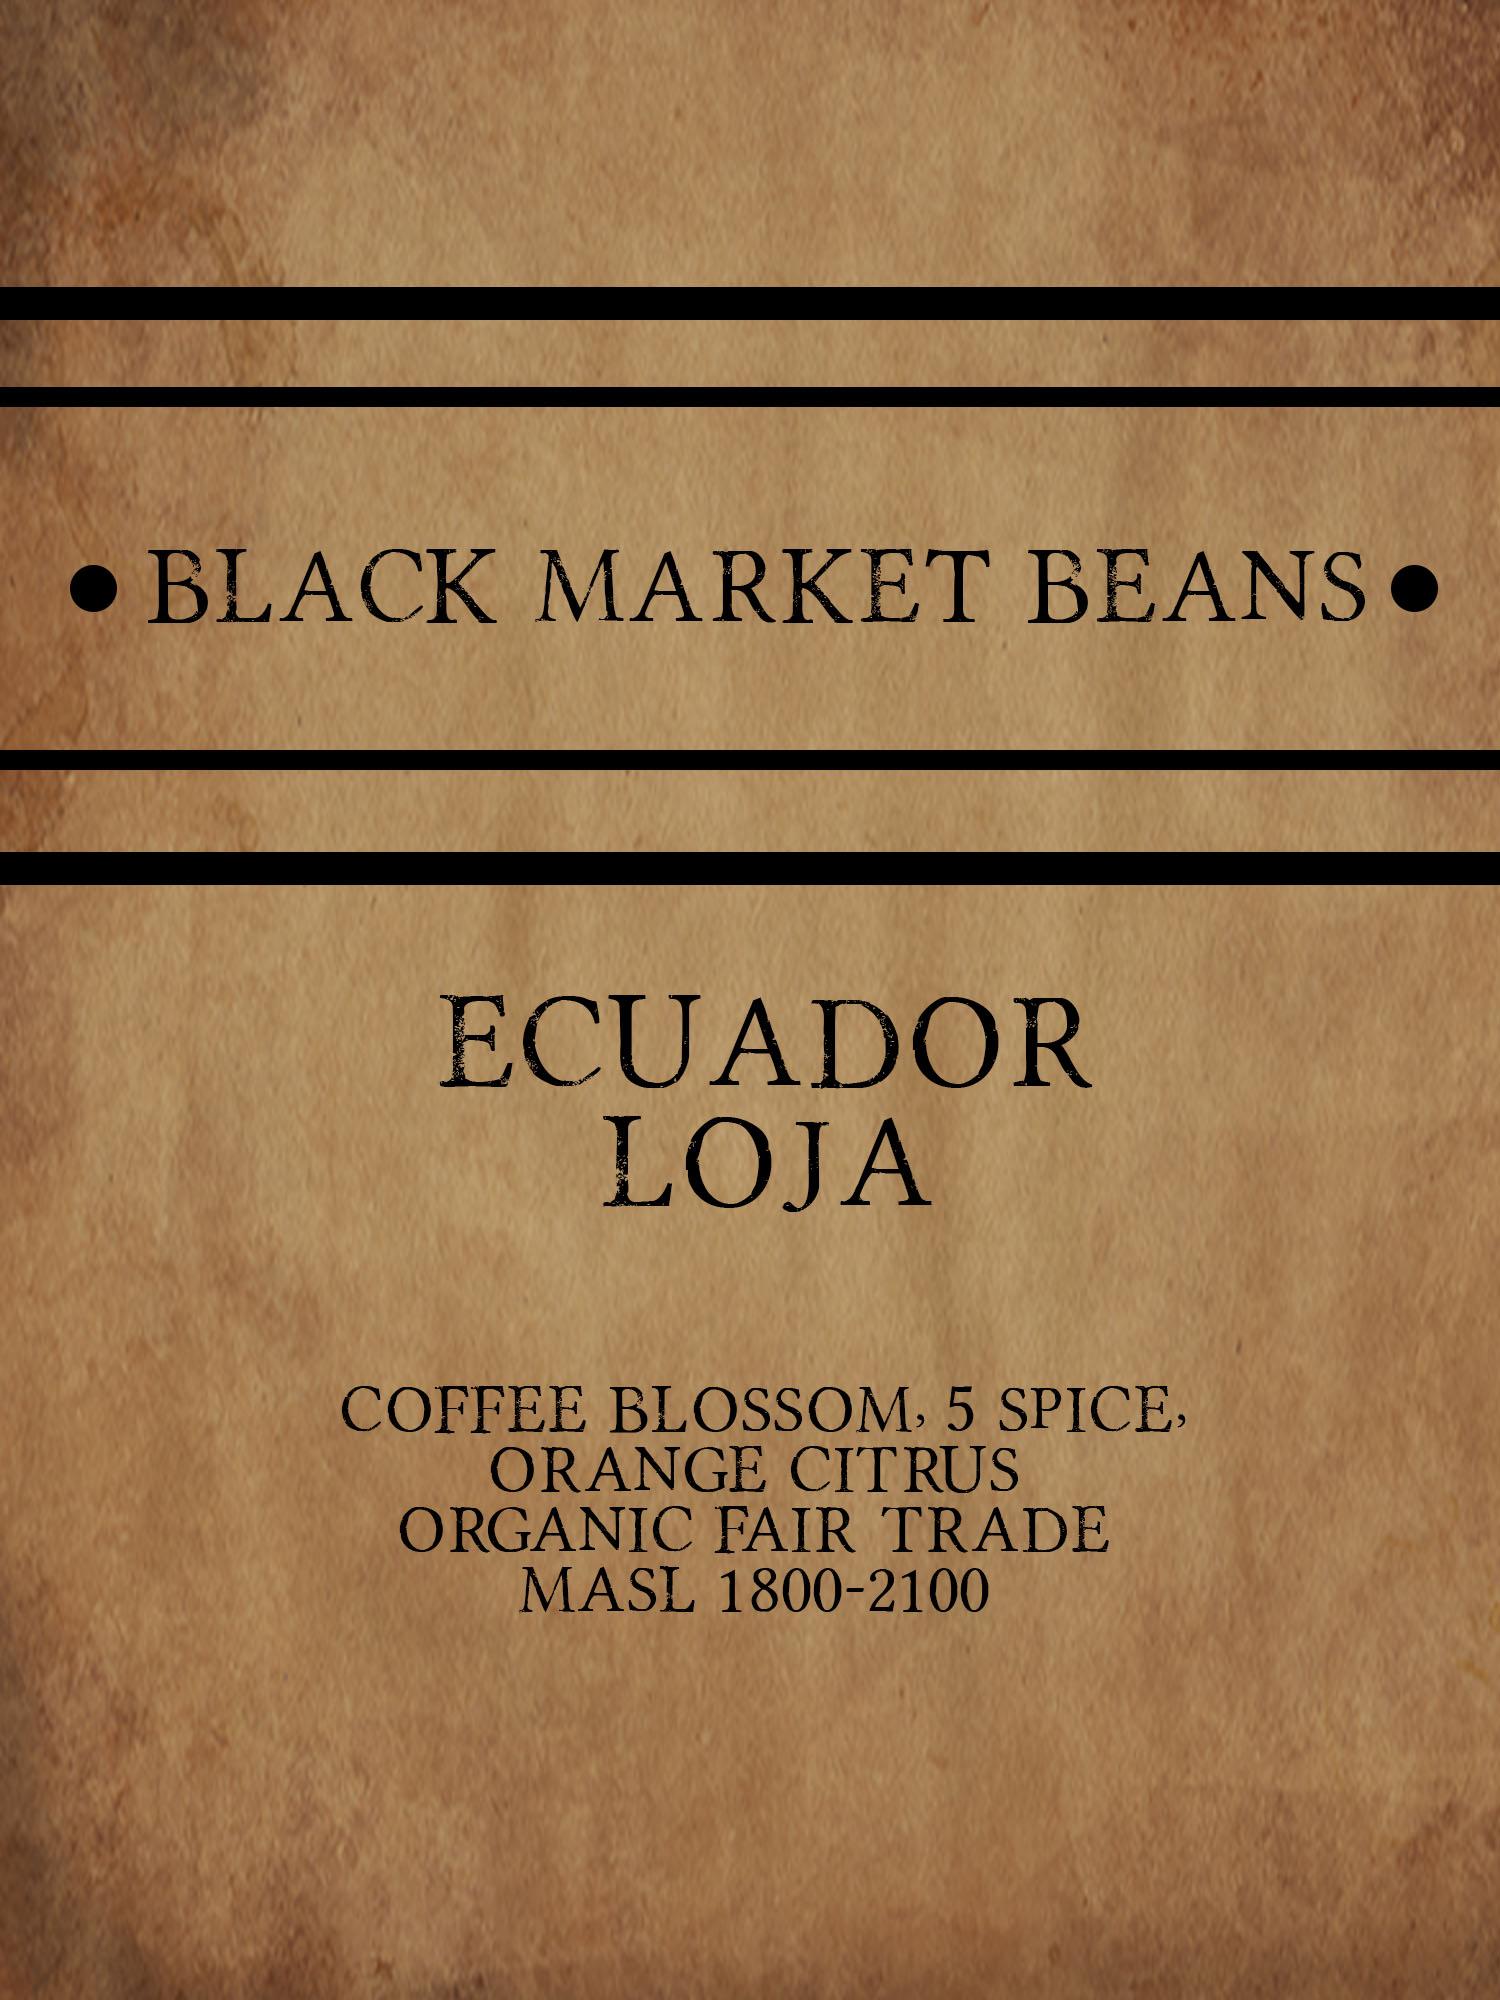 coffee_Ecuador - Loja.jpg